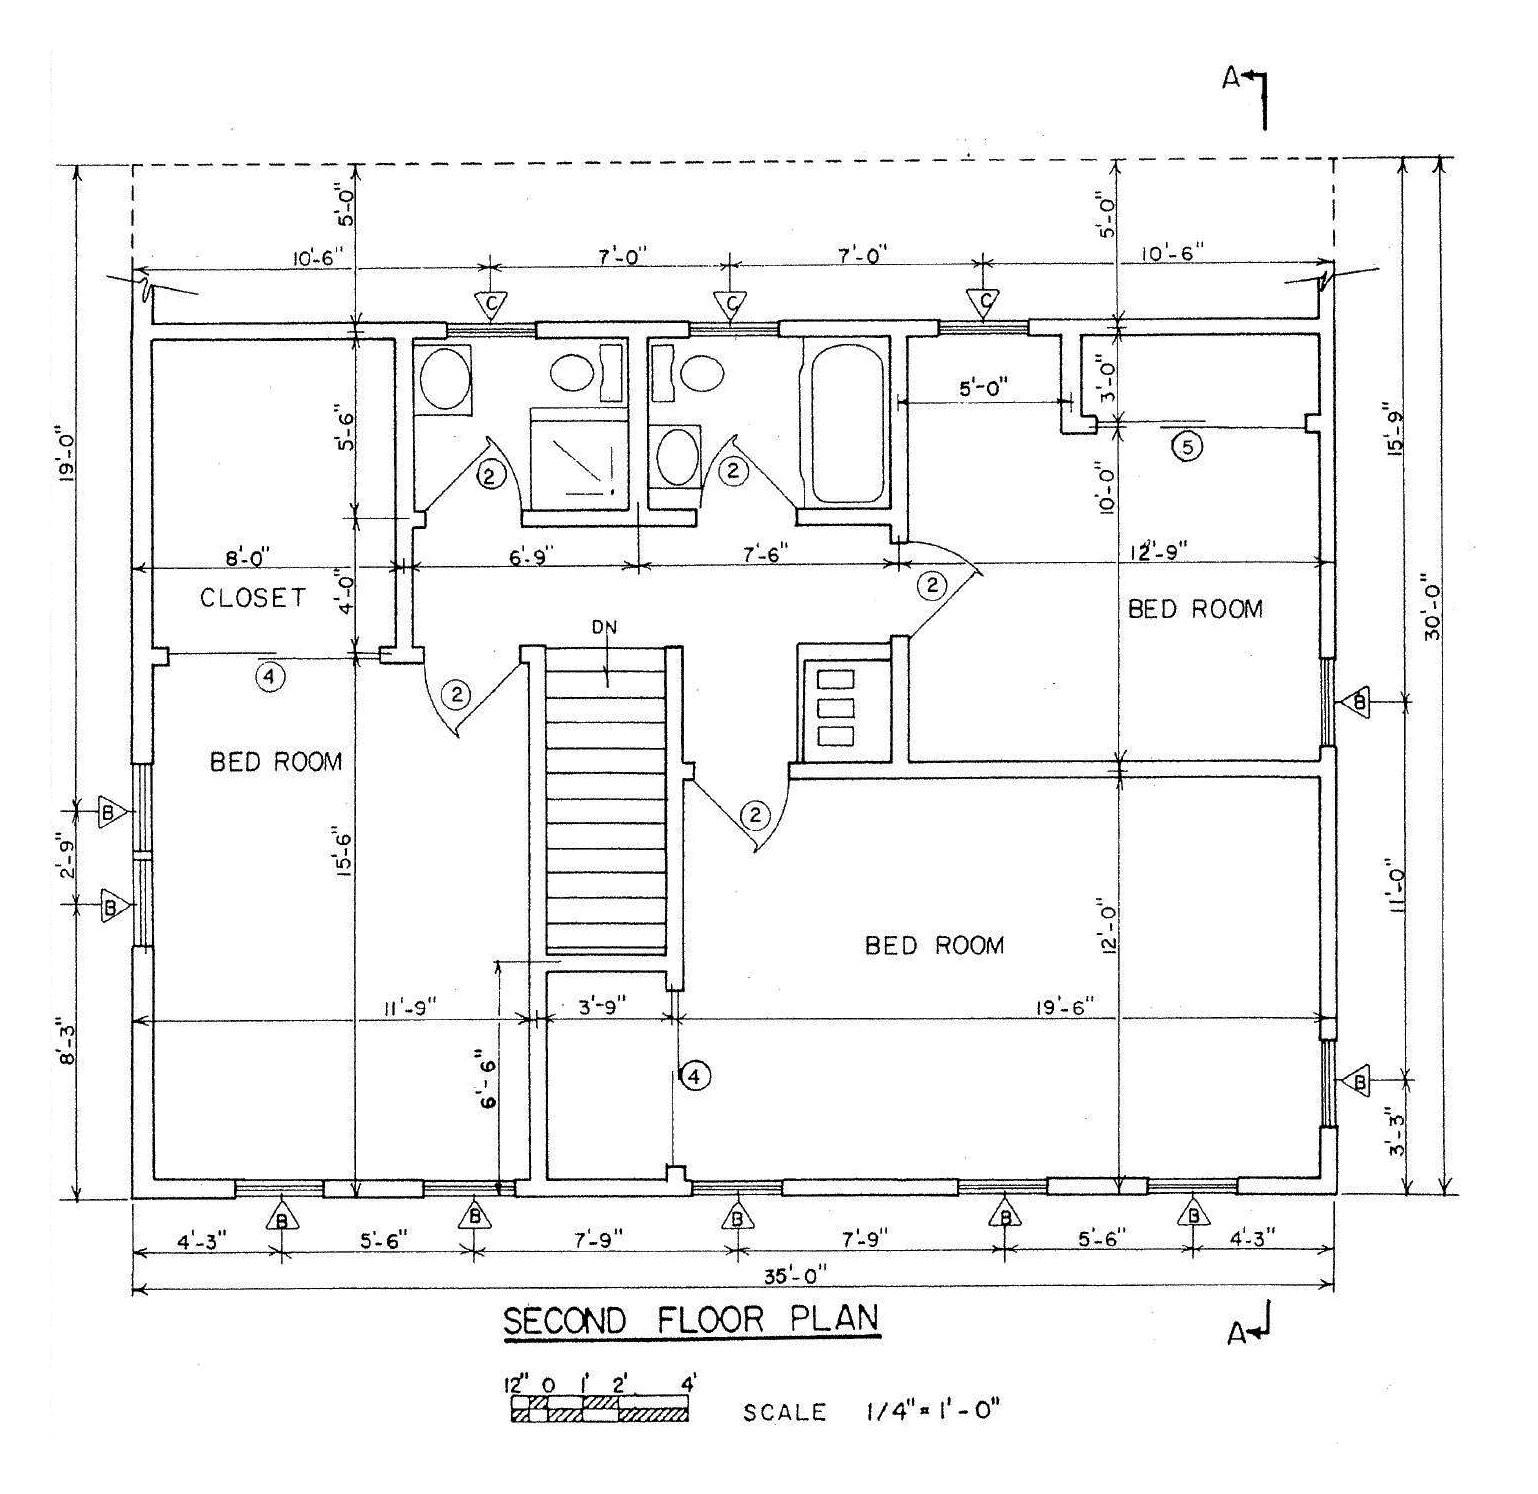 free floor plan app for designs event barn basement residential generator a program 2d floorplans floorplanning creator easiest